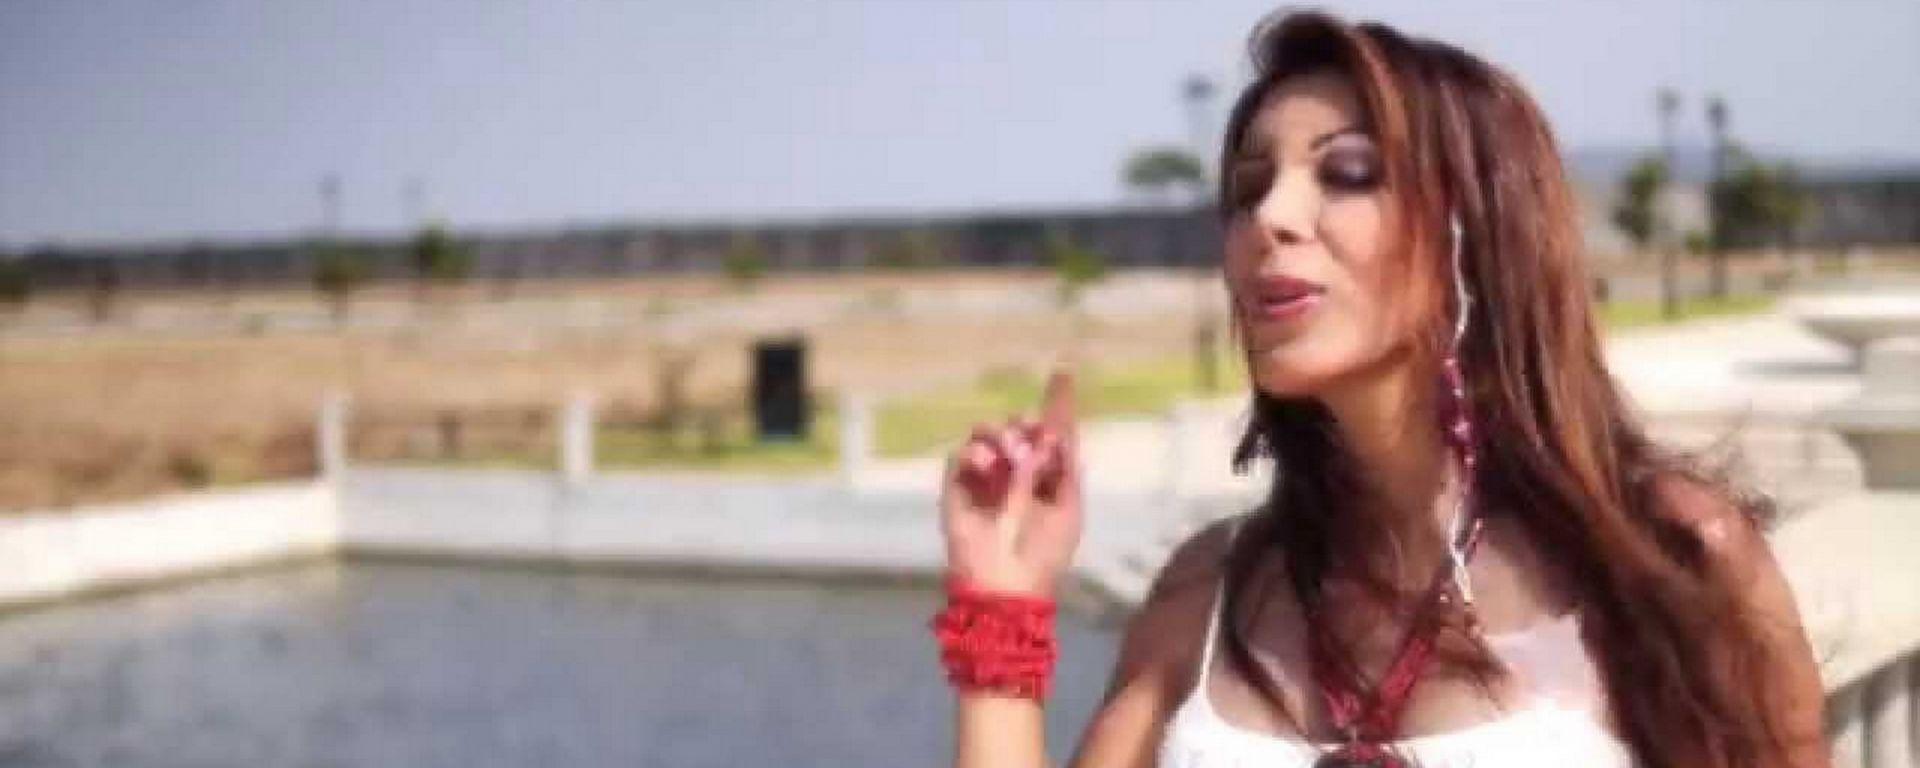 Laura Paulinha Calahorrano è mancata in un incidente stradale a Milano